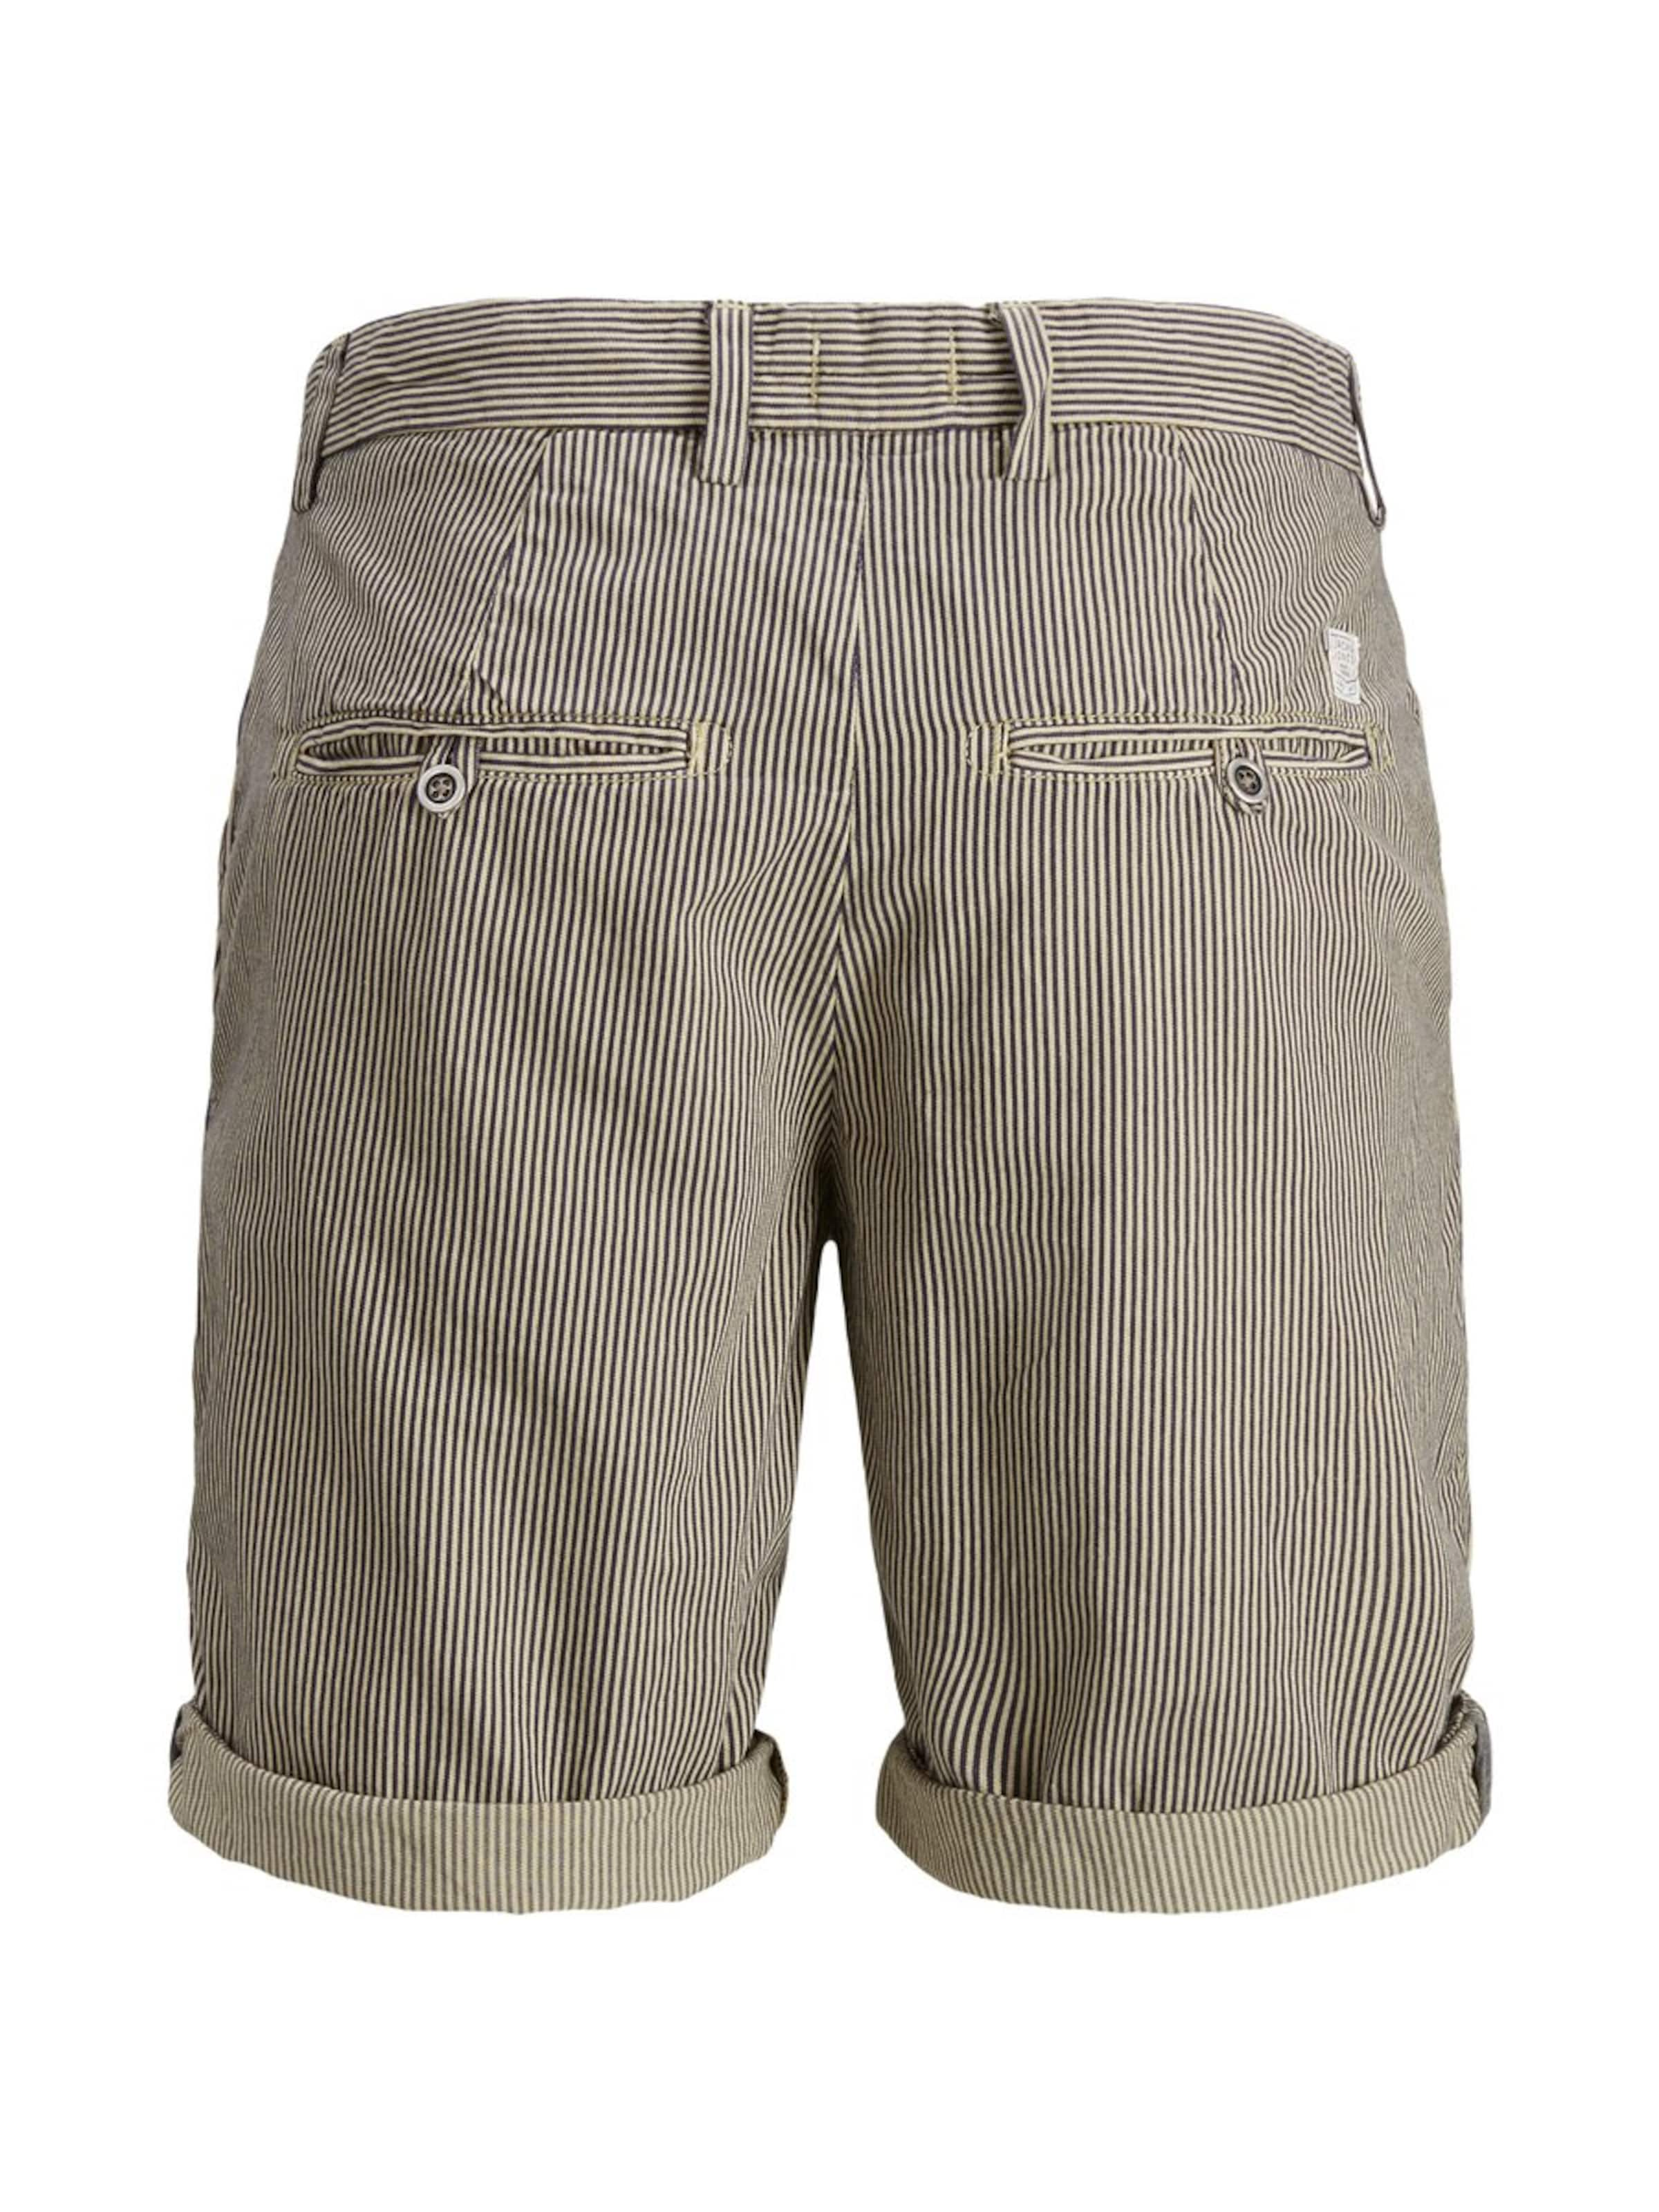 Jackamp; Jones Pantalon Gris À Foncé Pince En wkO8n0P